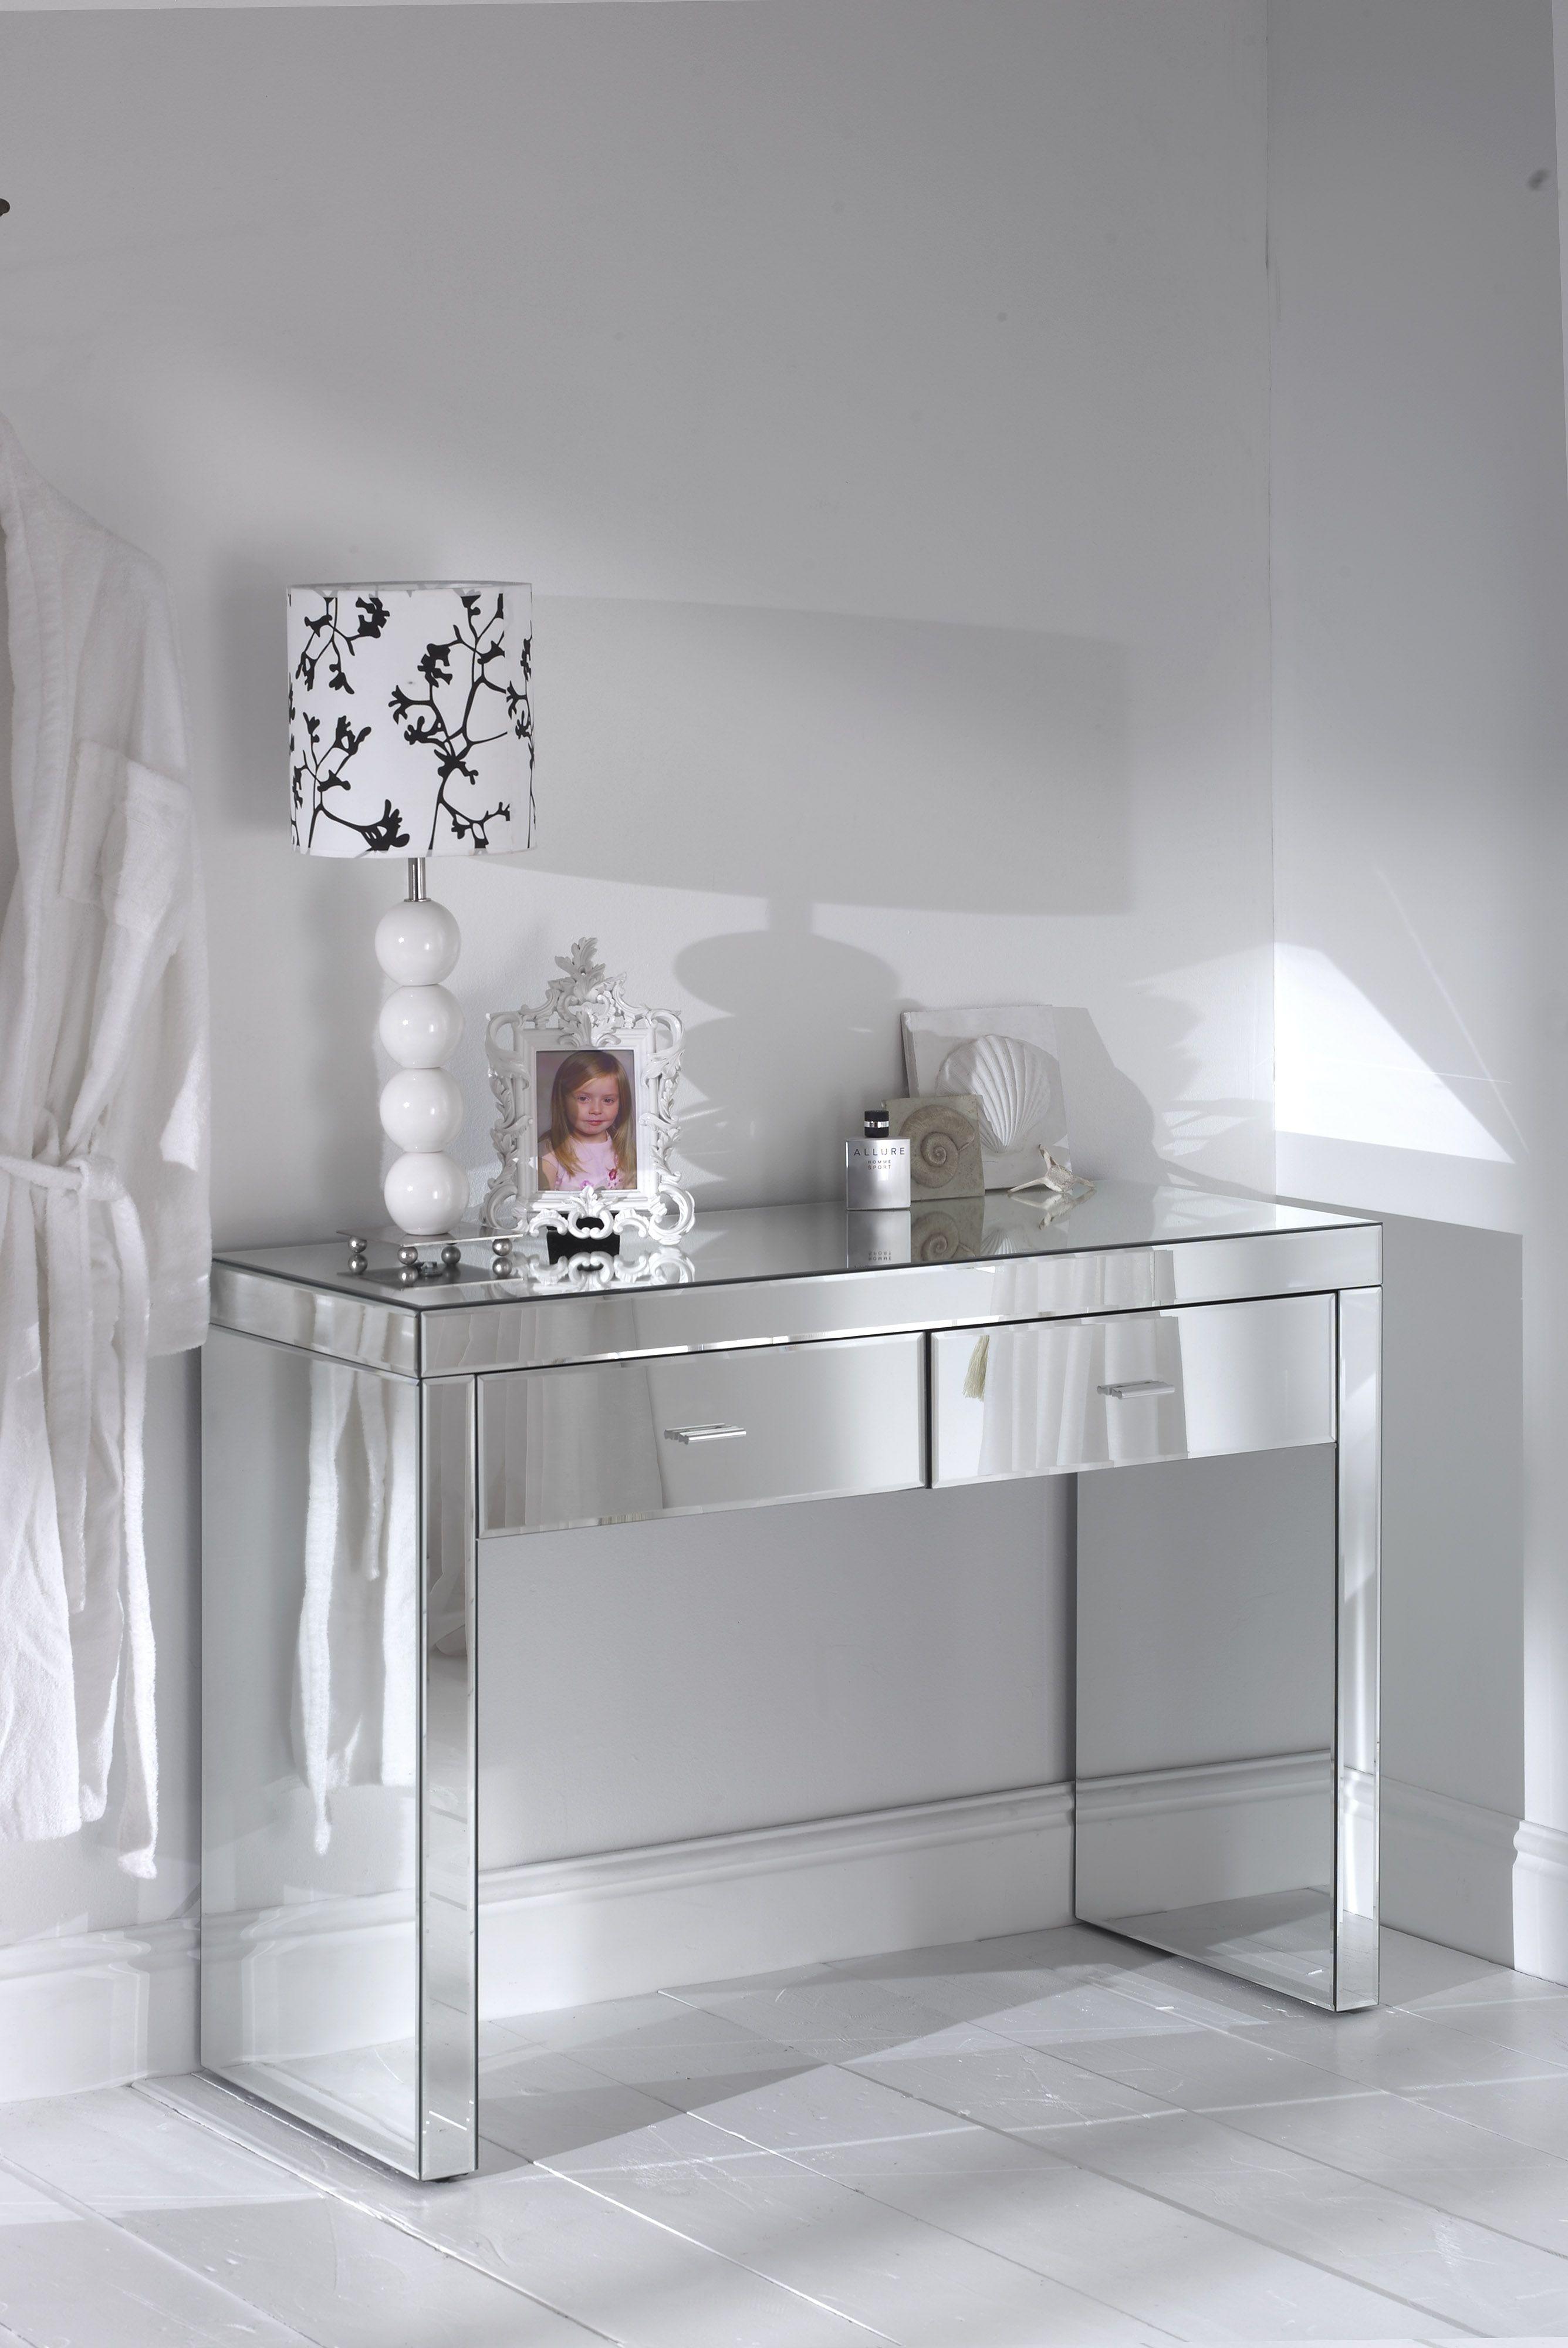 Amazing Glass Mirrored Romano Console Table